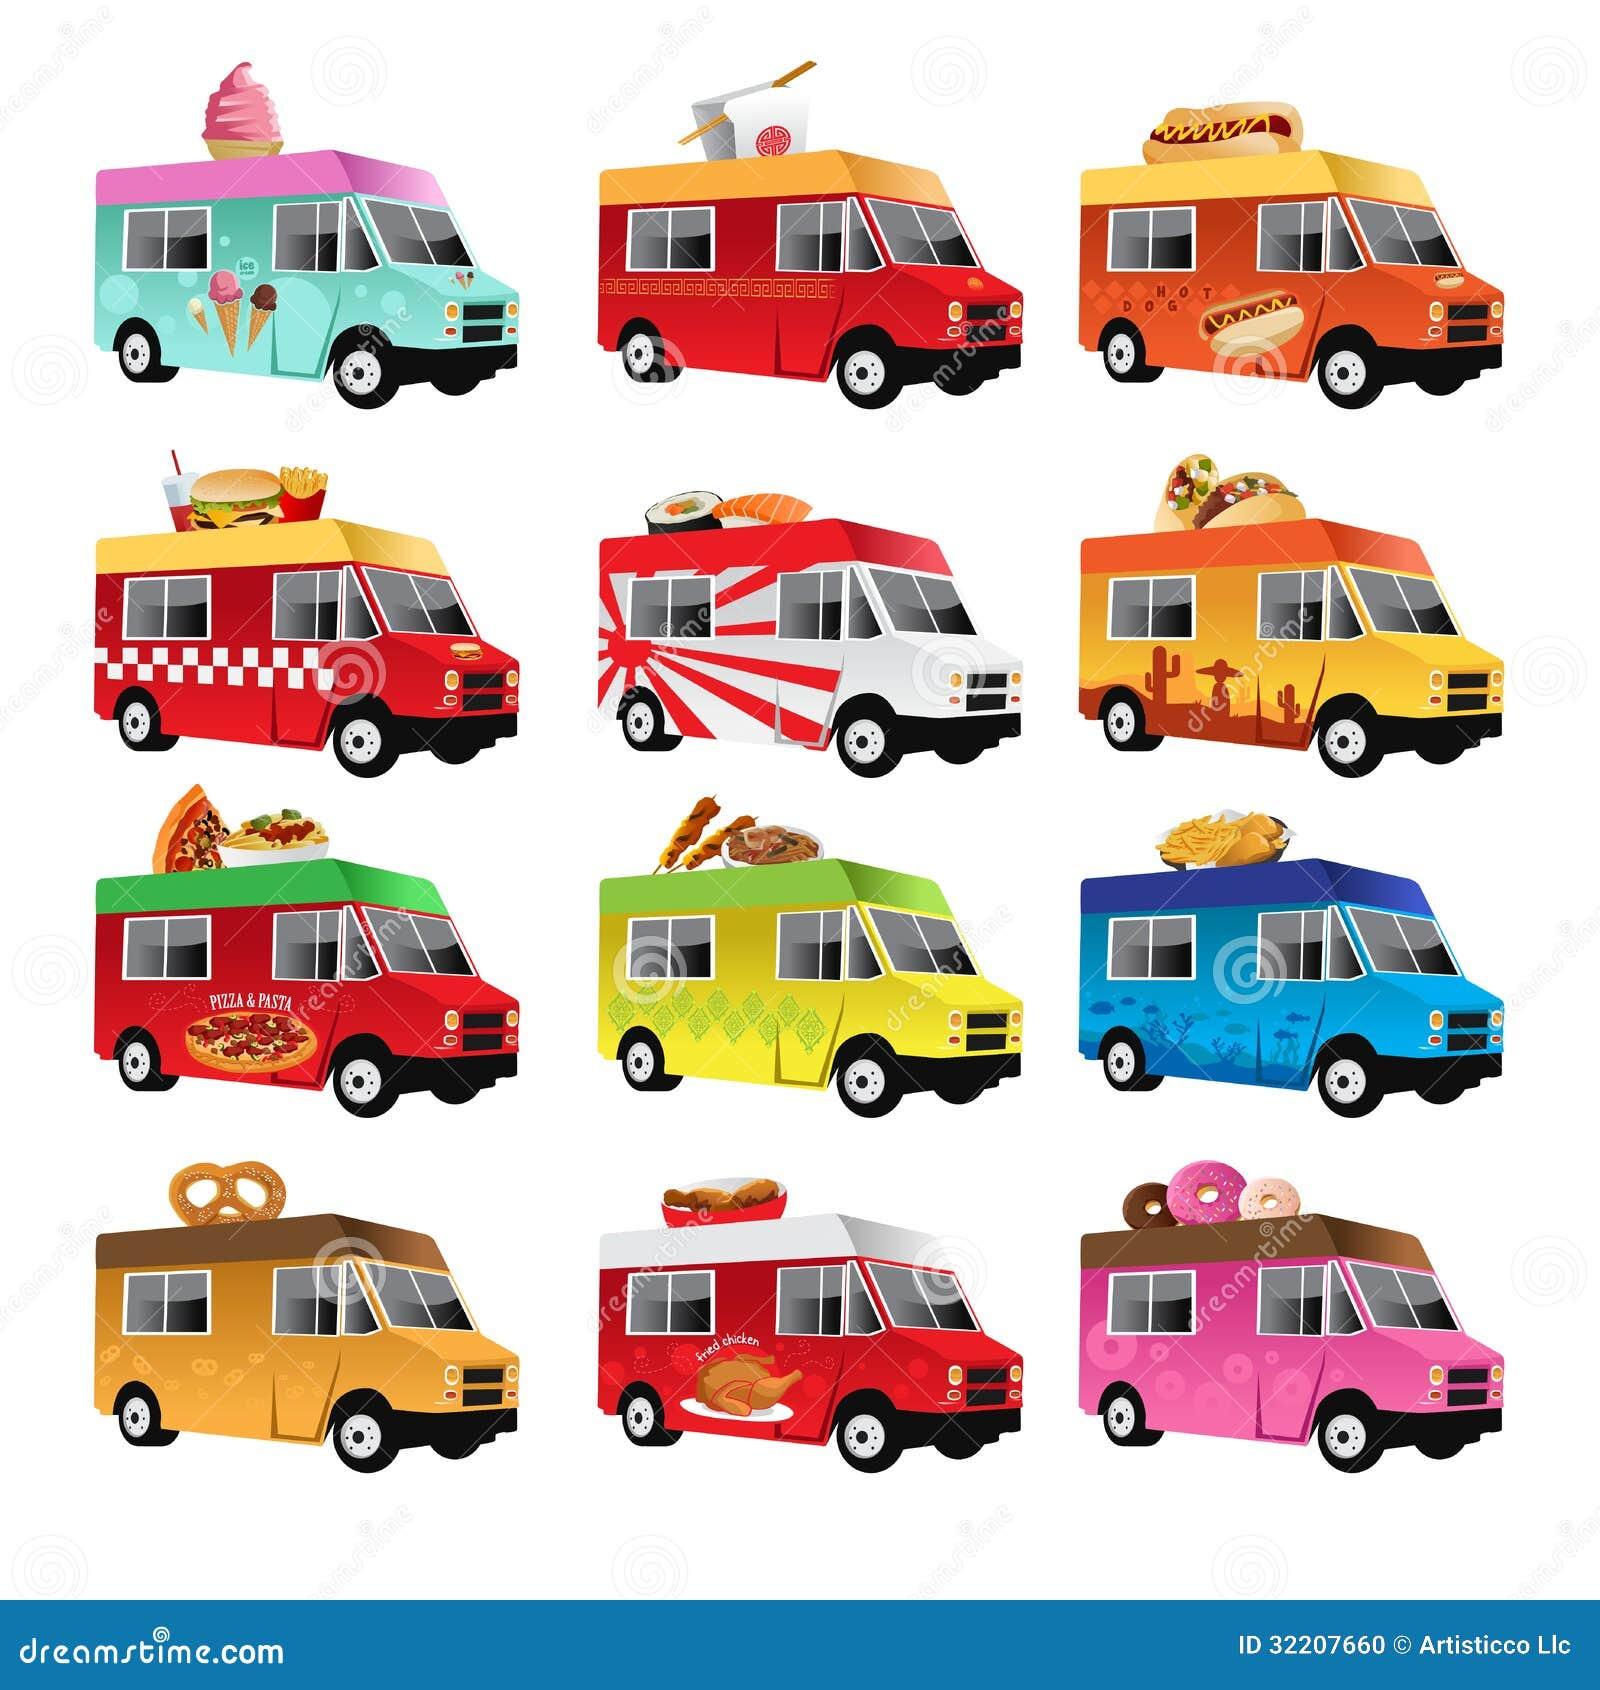 vector illustration of food truck icon designs.